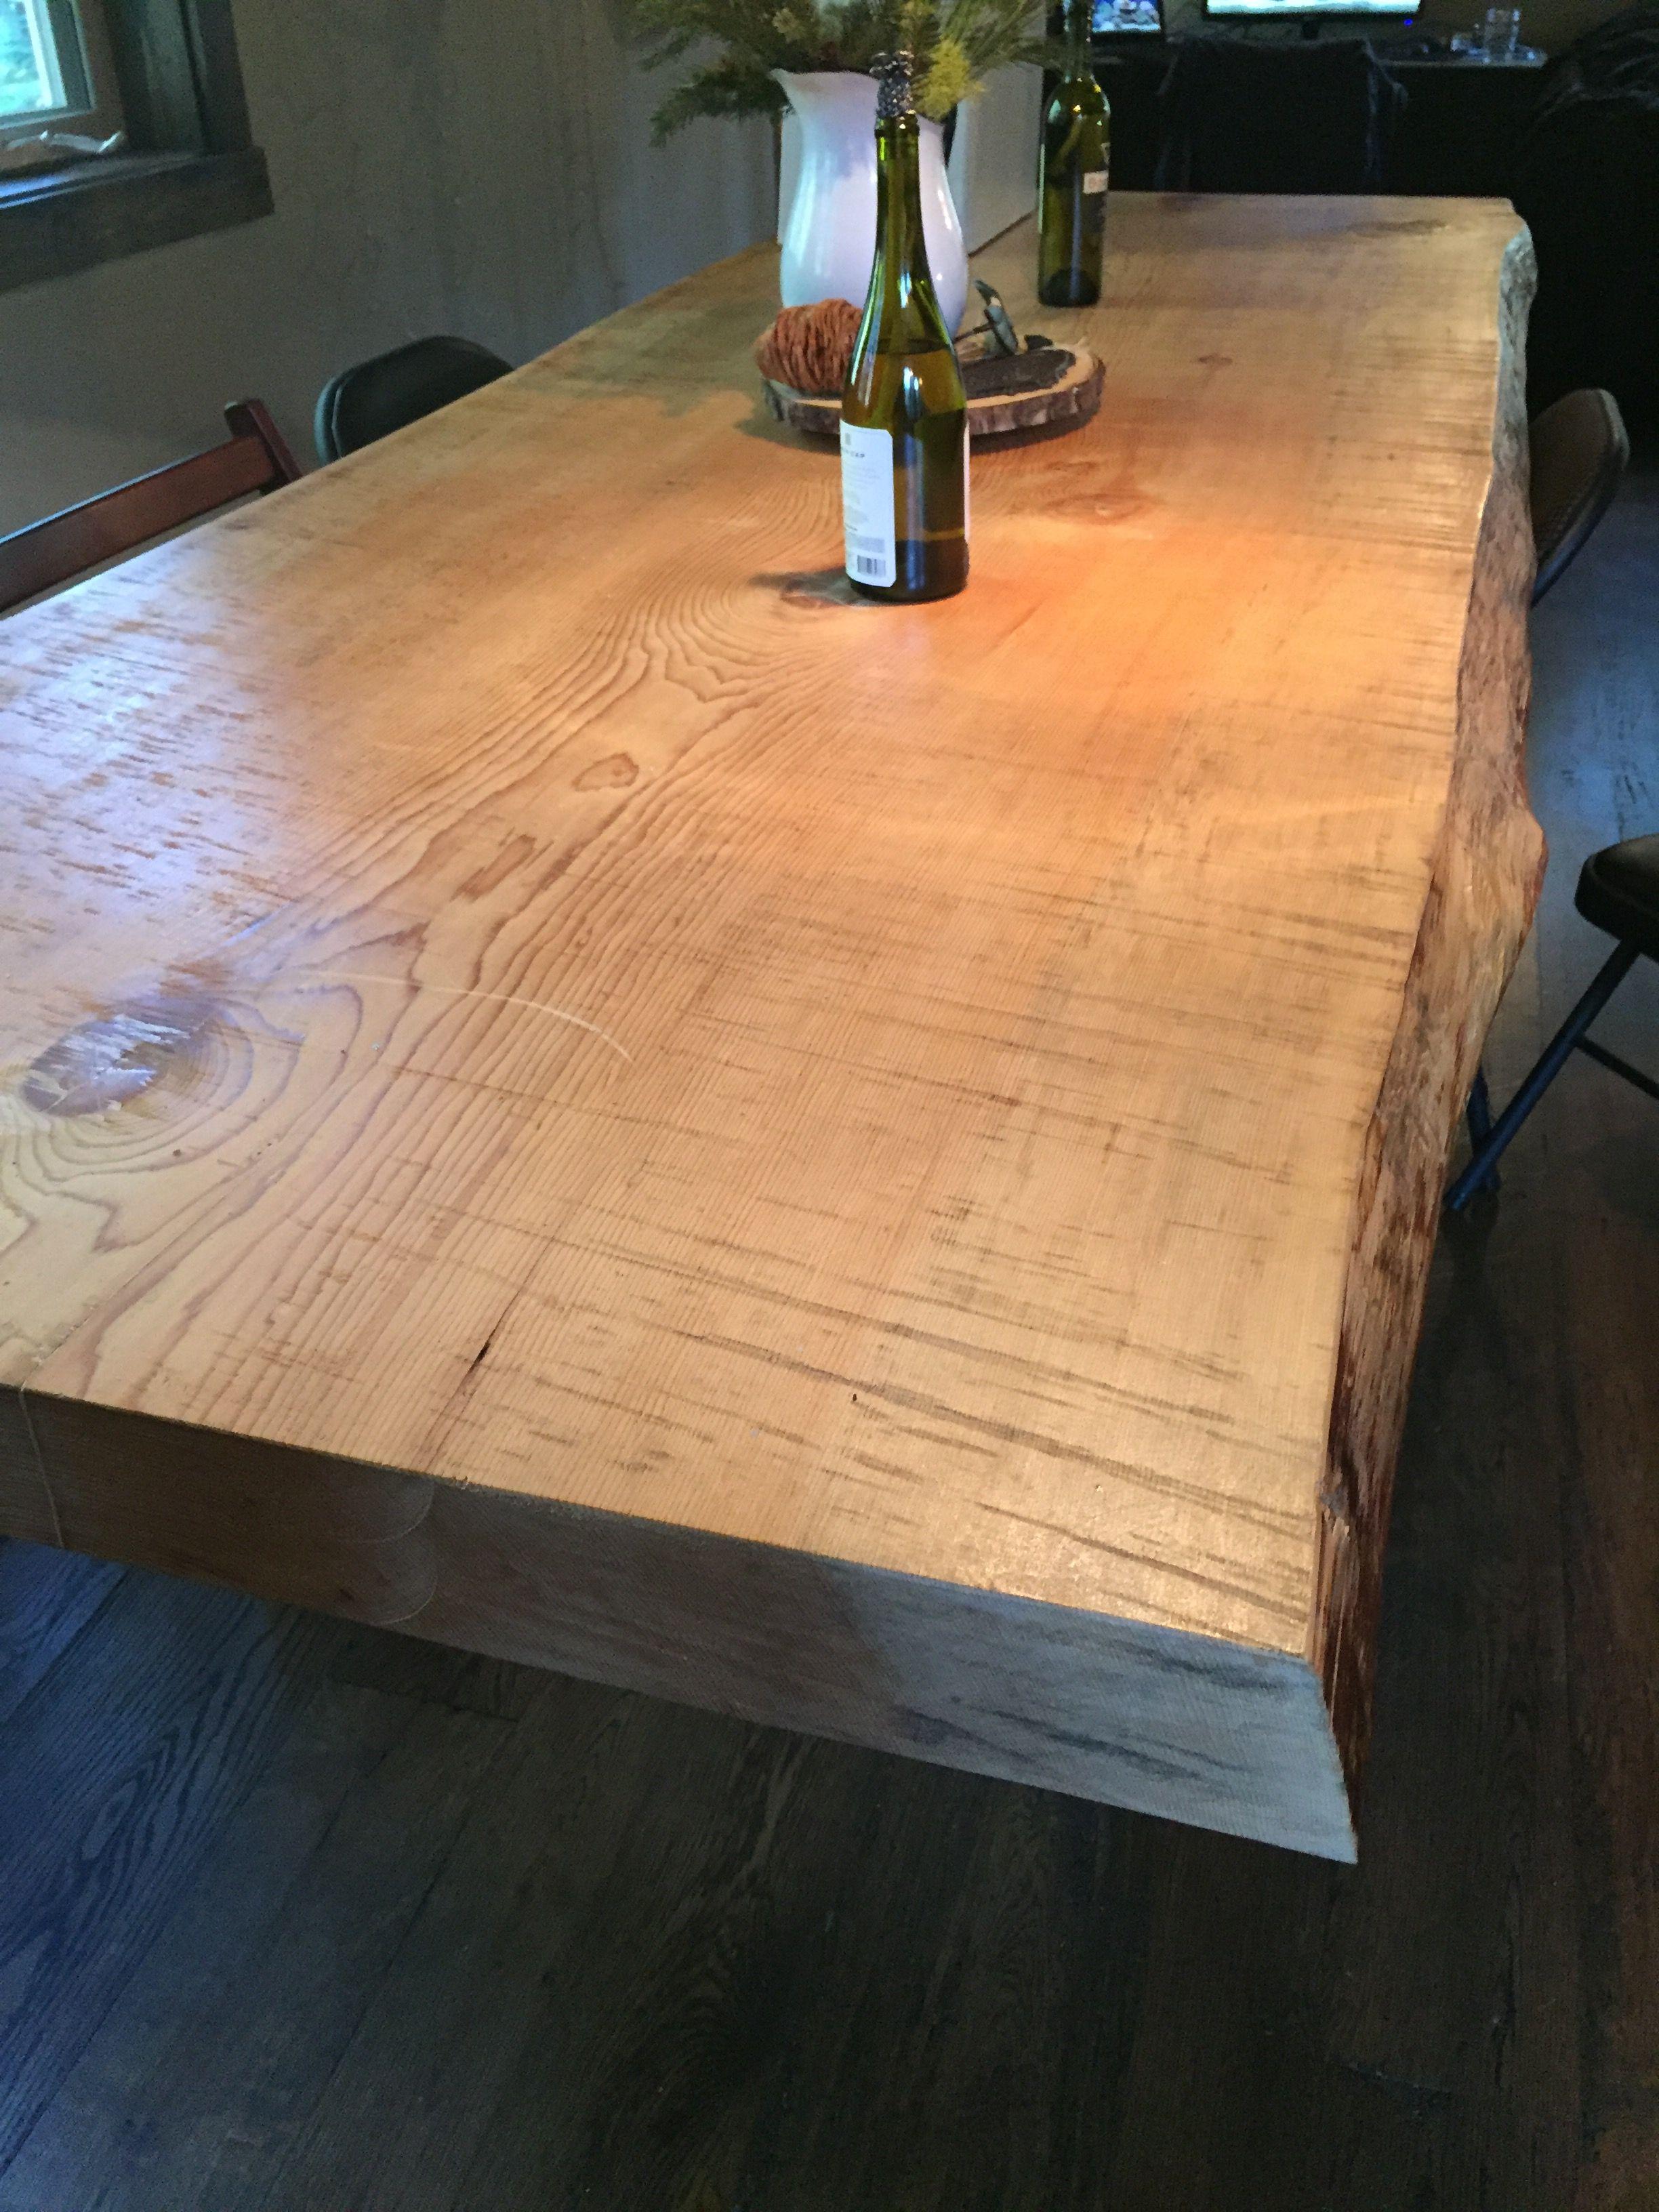 Handmade 10 foot red fir dining table Cabin ReBuild